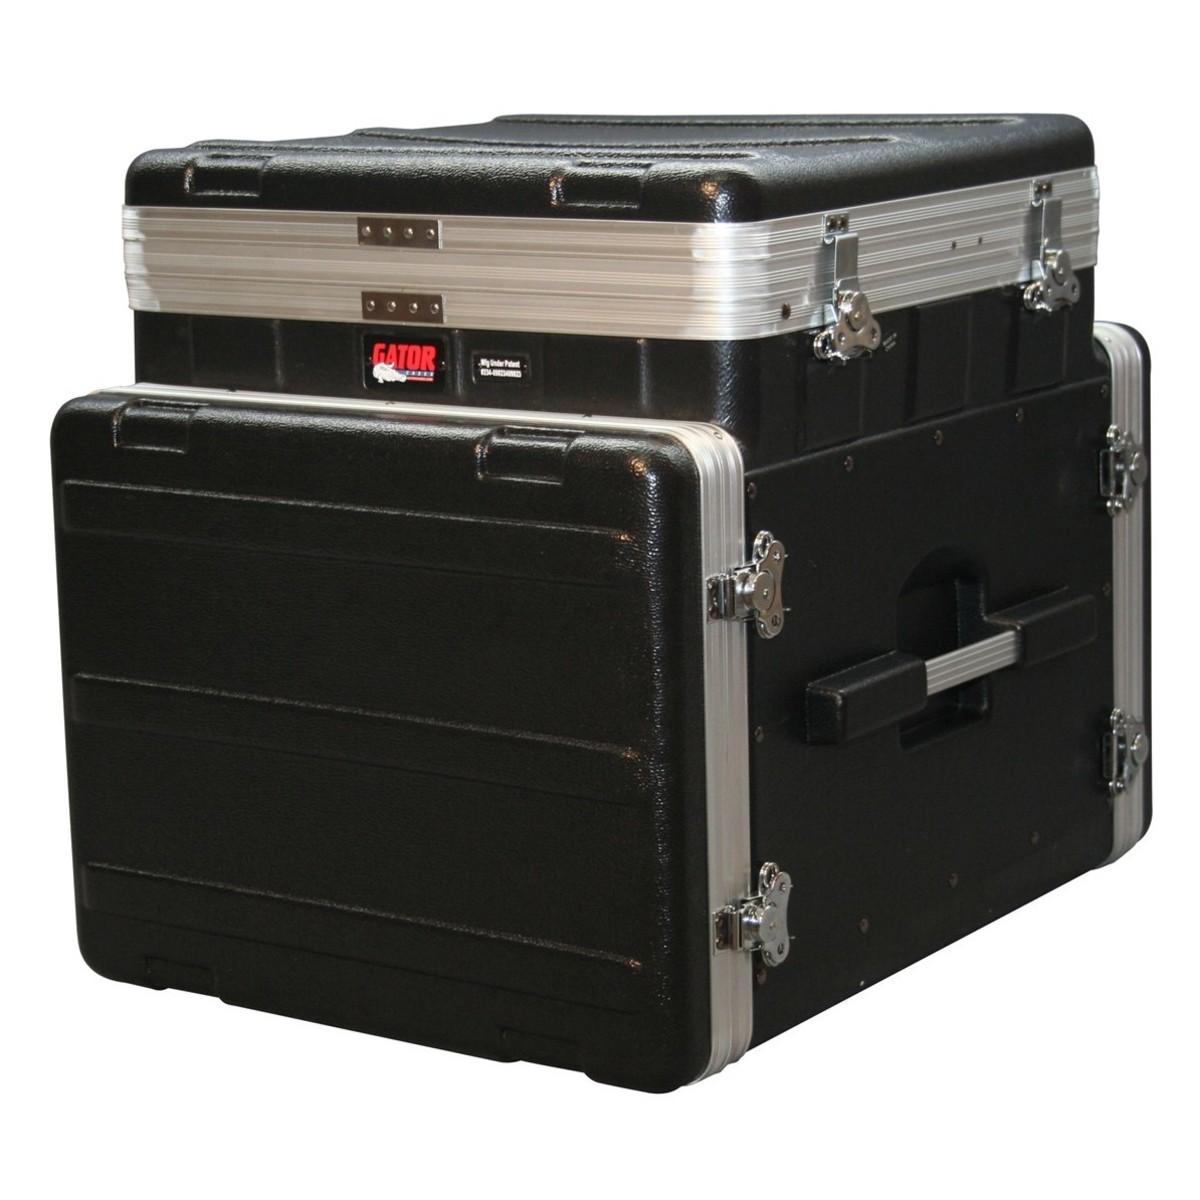 Gator GRC-10X8 PU Moulded Pop-Up Console Rack Case, 10U Top, 8U Side ...